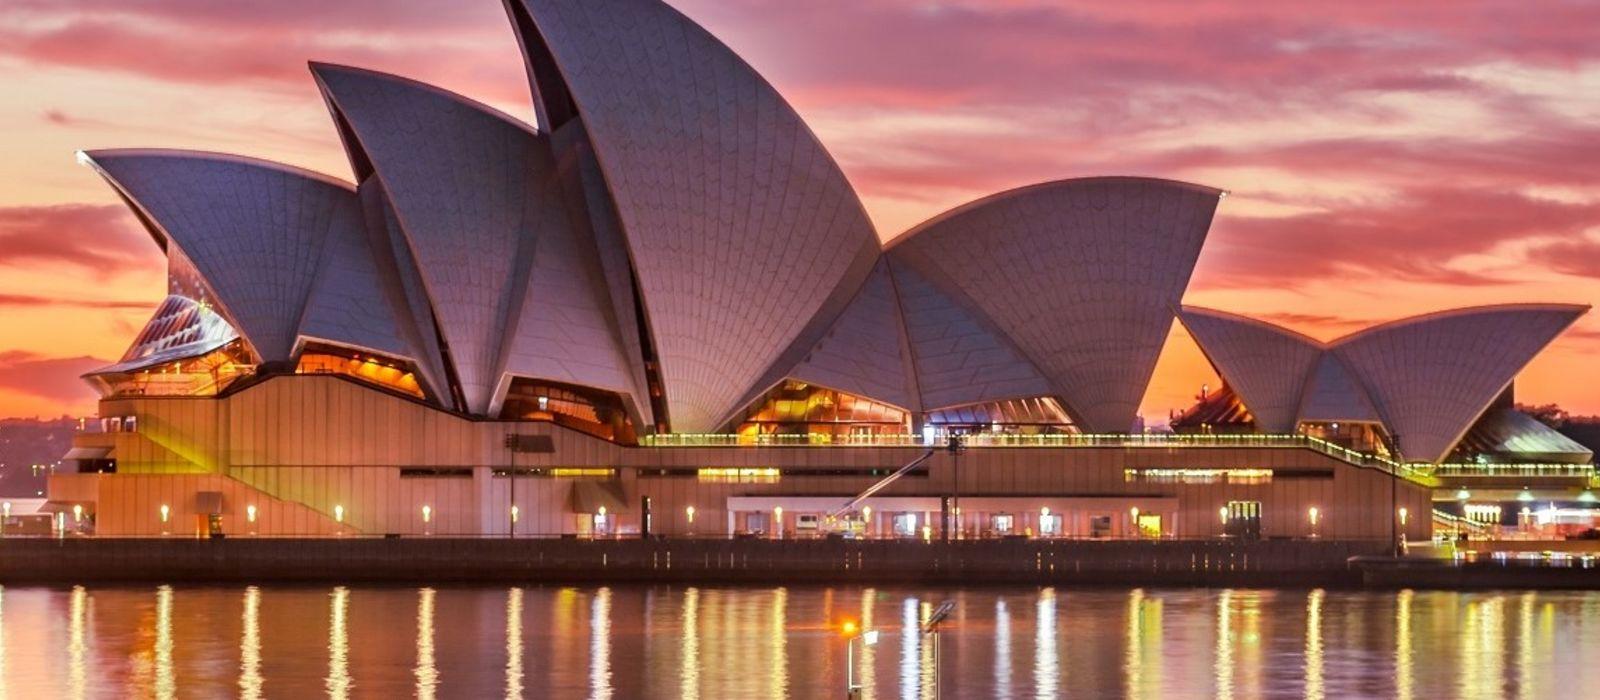 Australien: Großstadtleben & Great Barrier Reef Urlaub 4